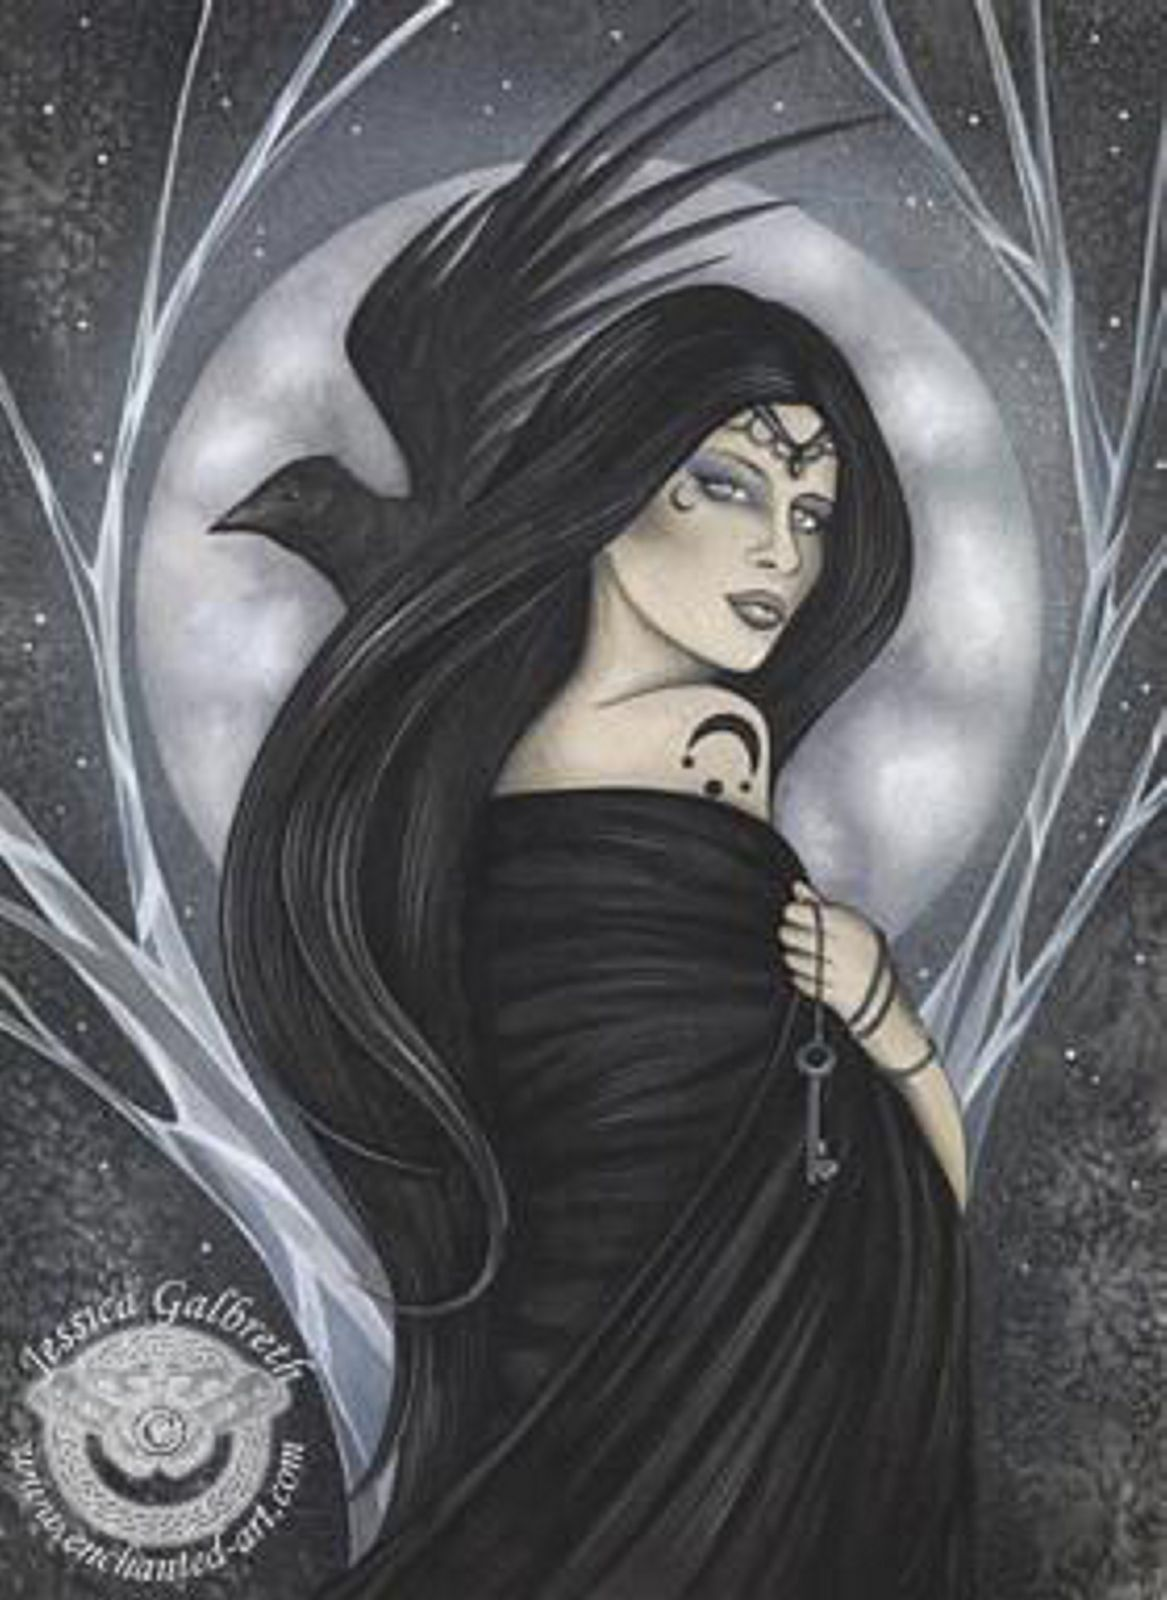 Nyx goddess of shadows biocorpaavc